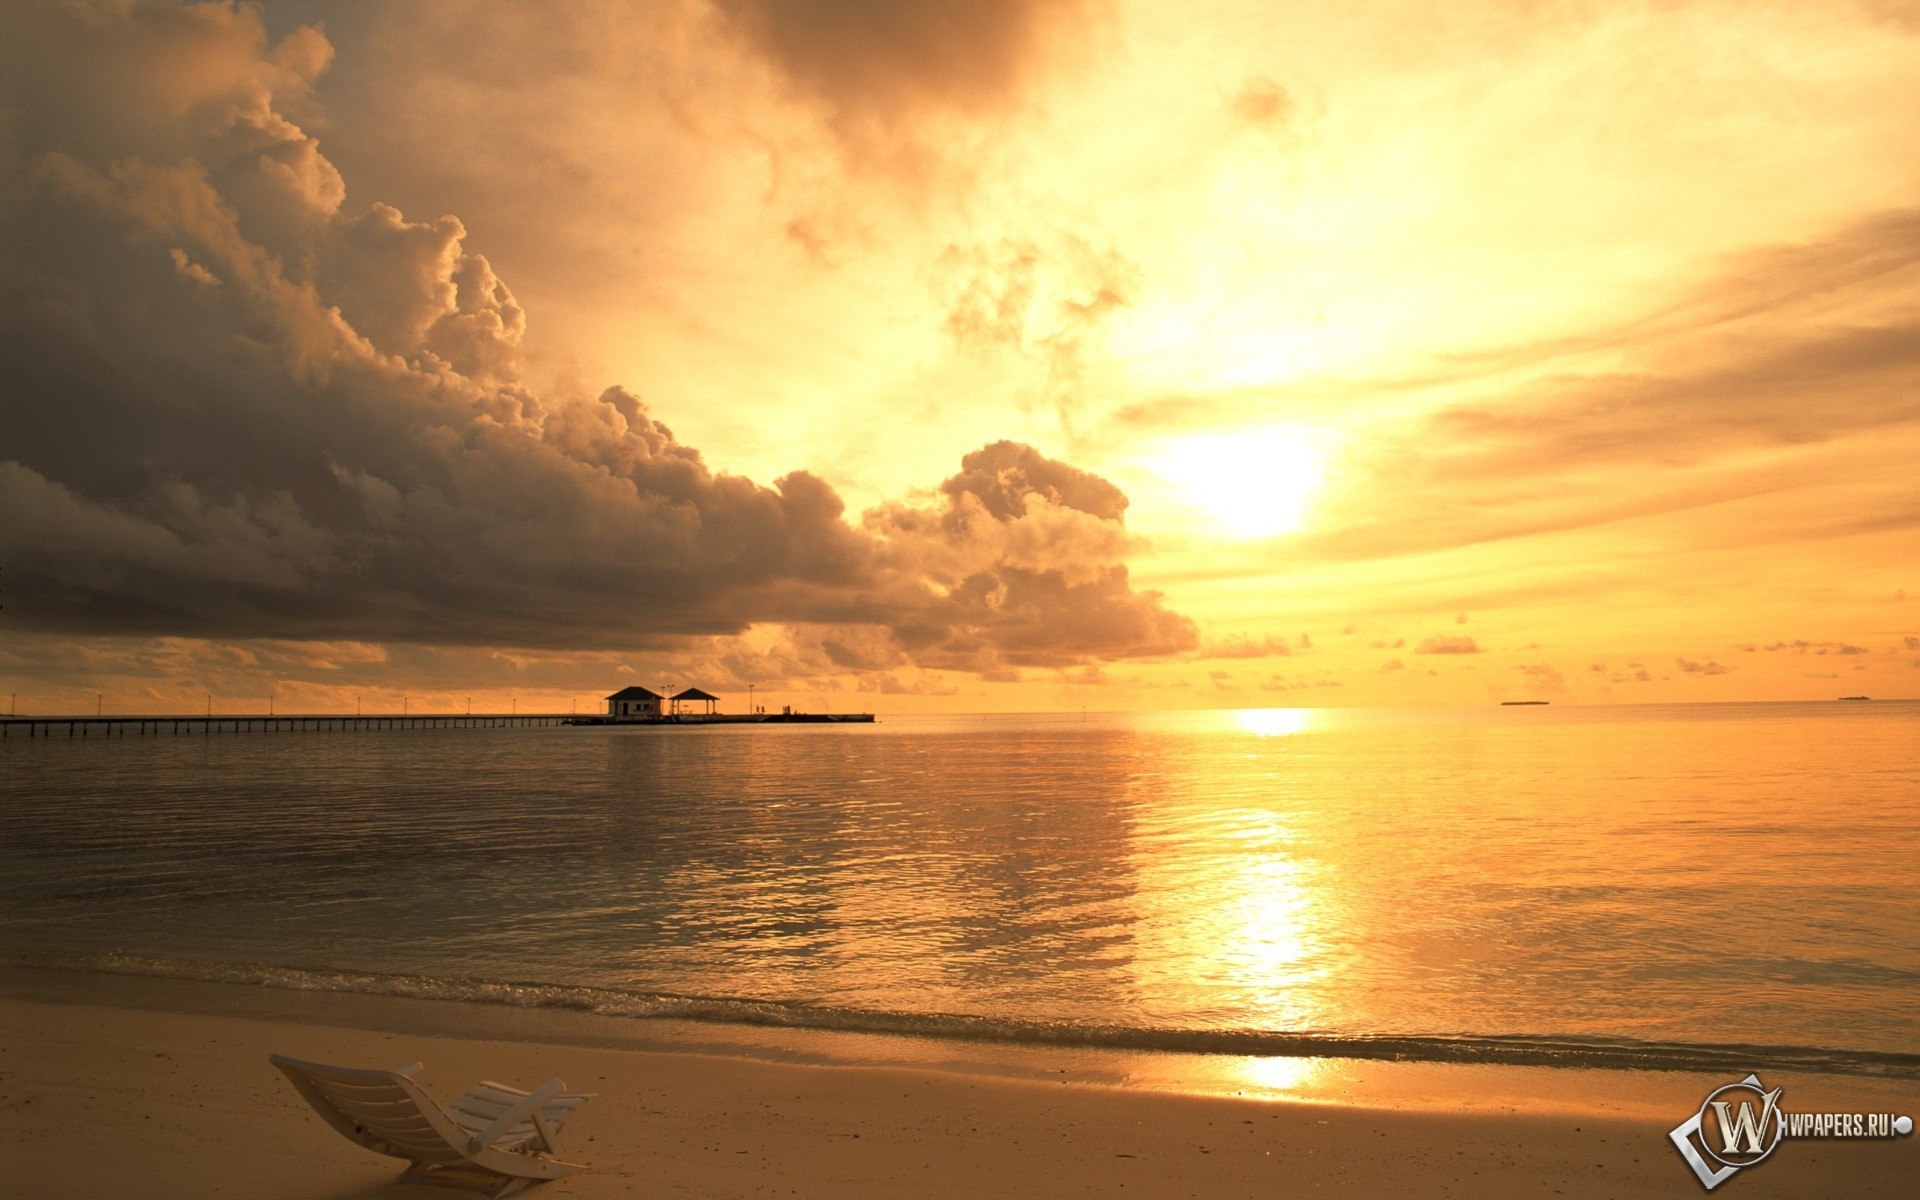 Обои пляж на закате на рабочий стол с